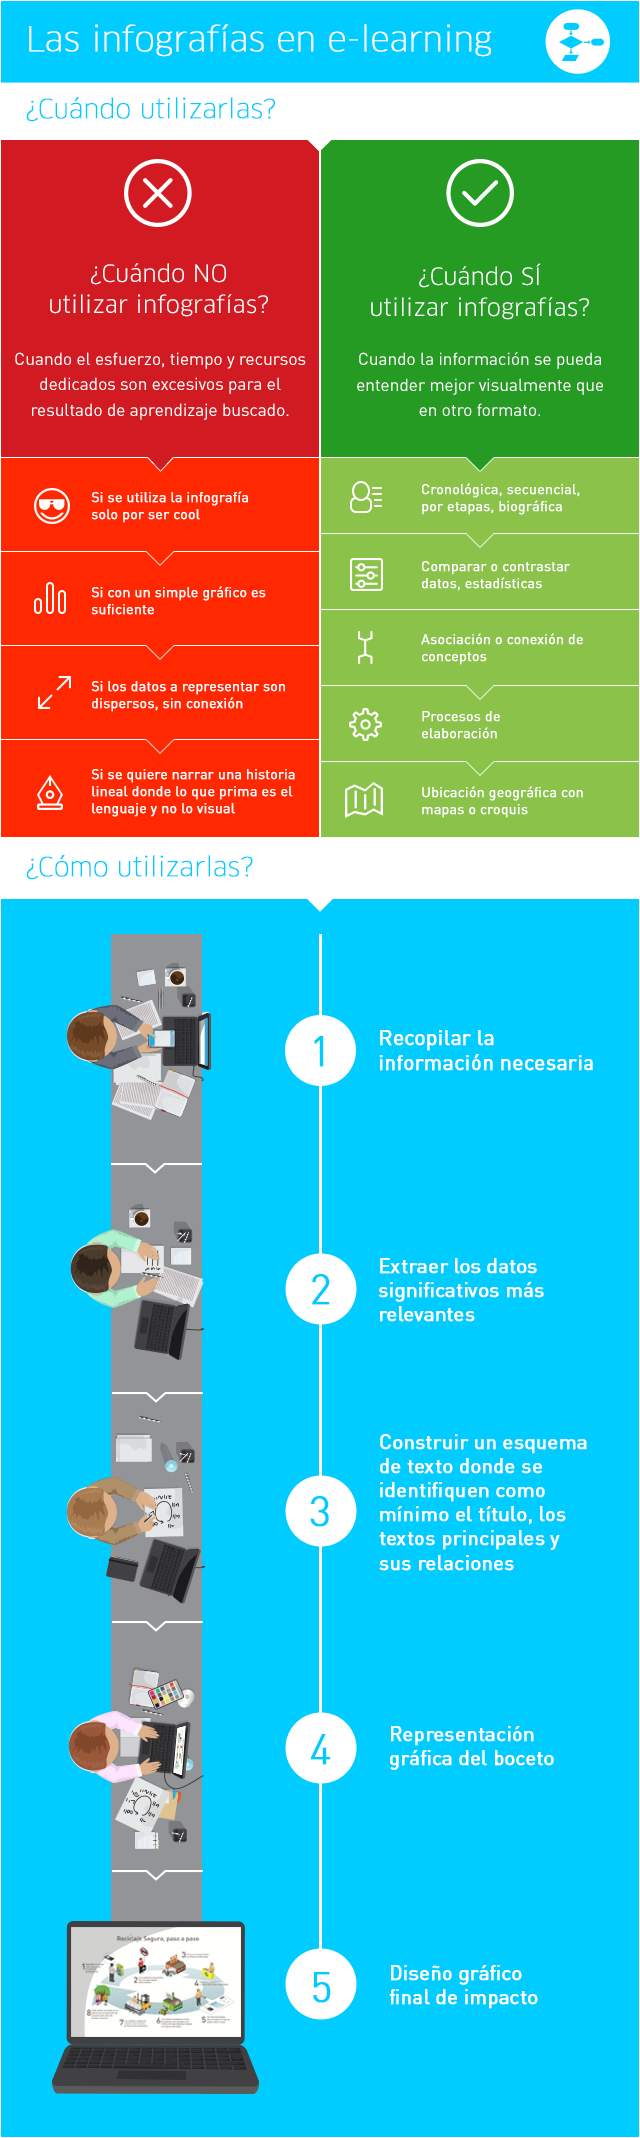 Infografías en eLearning